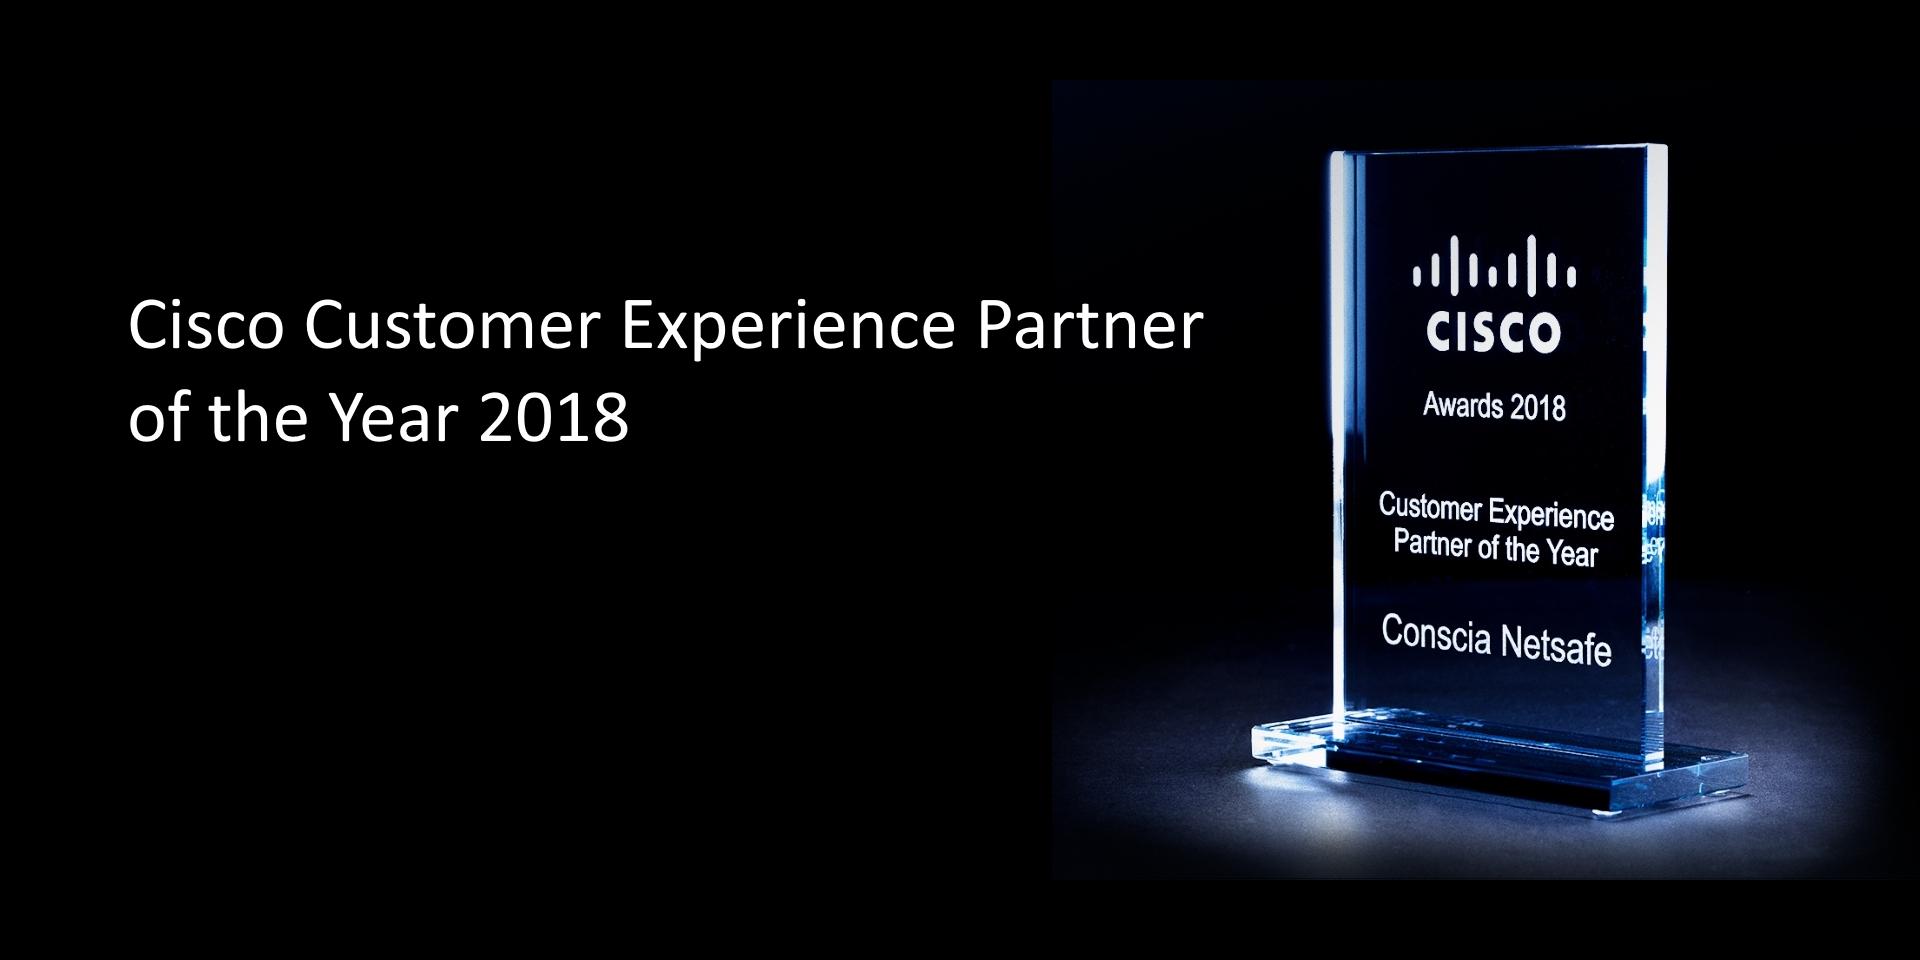 Cisco Customer Experience Partner 2018